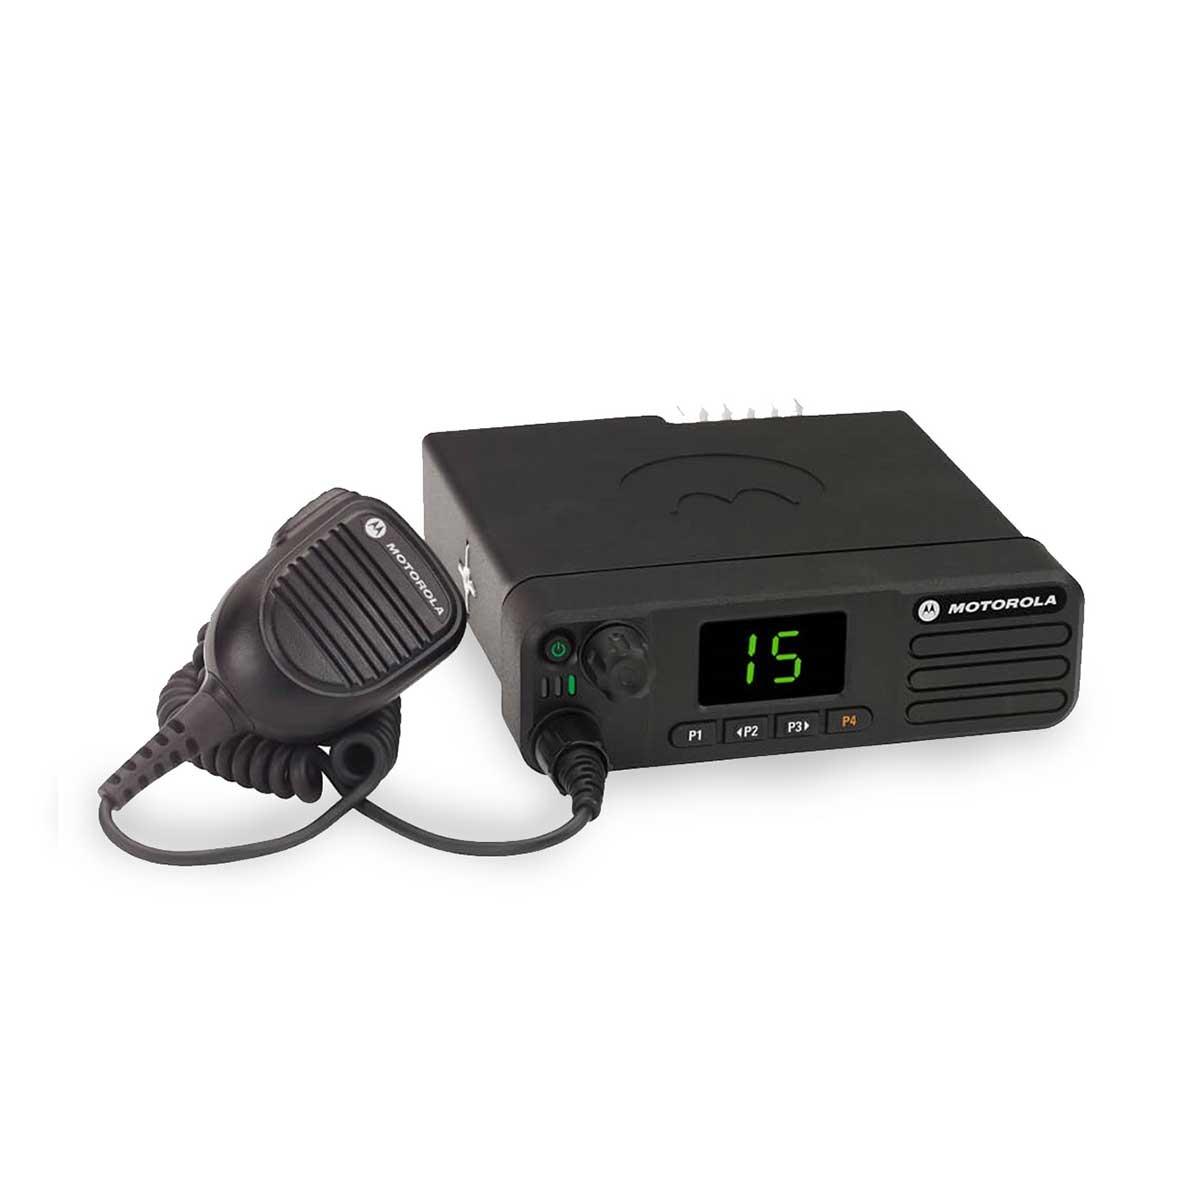 Radio Motorola DGM5000e Digital LAM28QNC9SA1AN UHF 403-470 MHZ de 25W